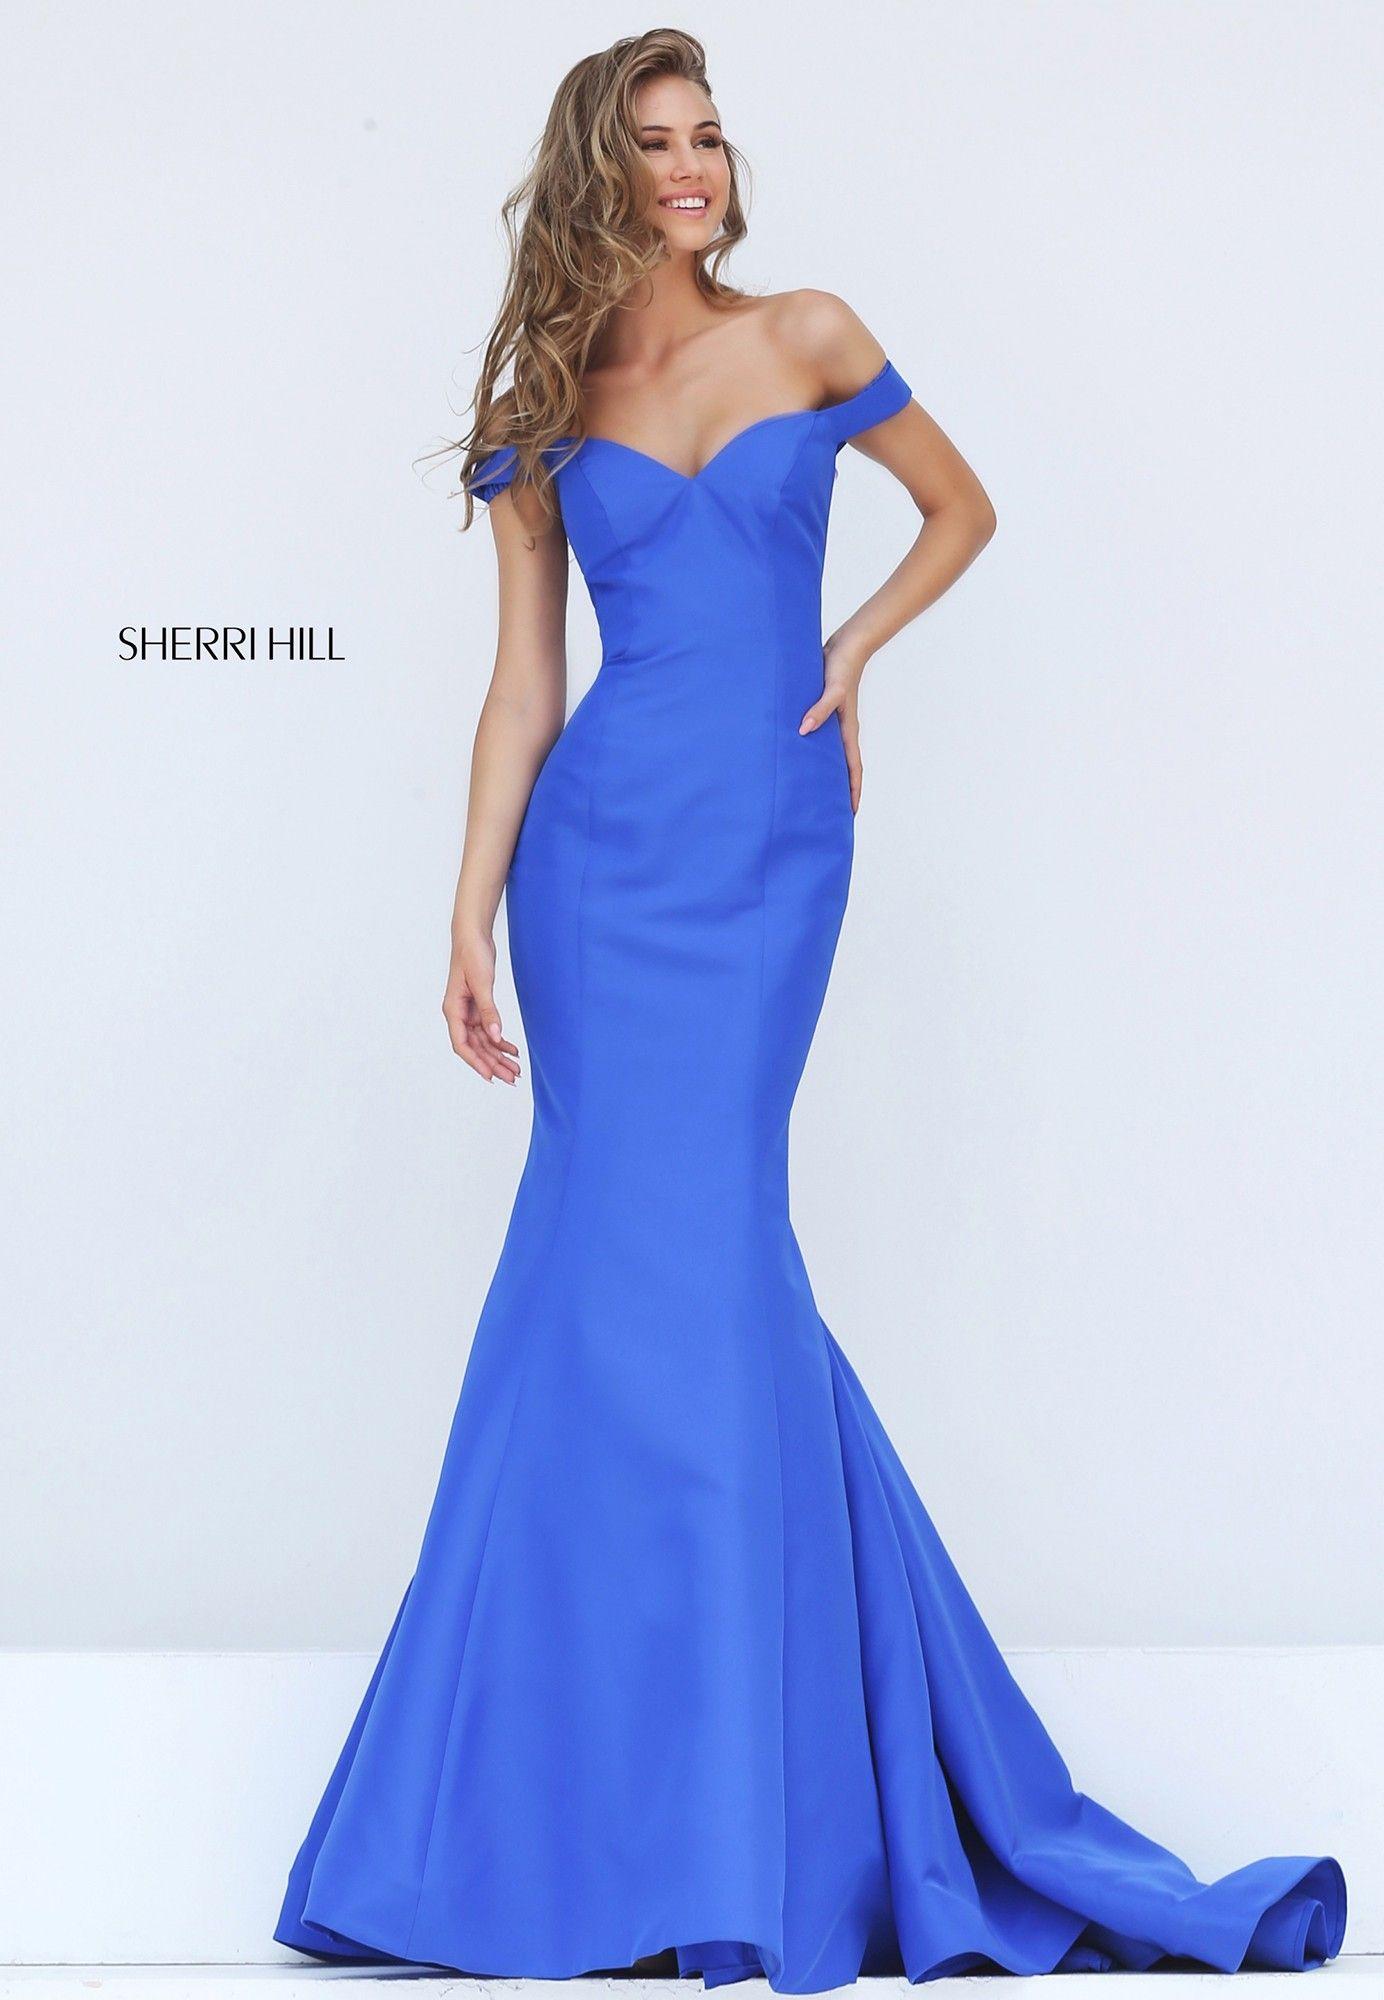 Sherri Hill 50823 Off Shoulder Fit & Flare Gown | Elegant gown ...